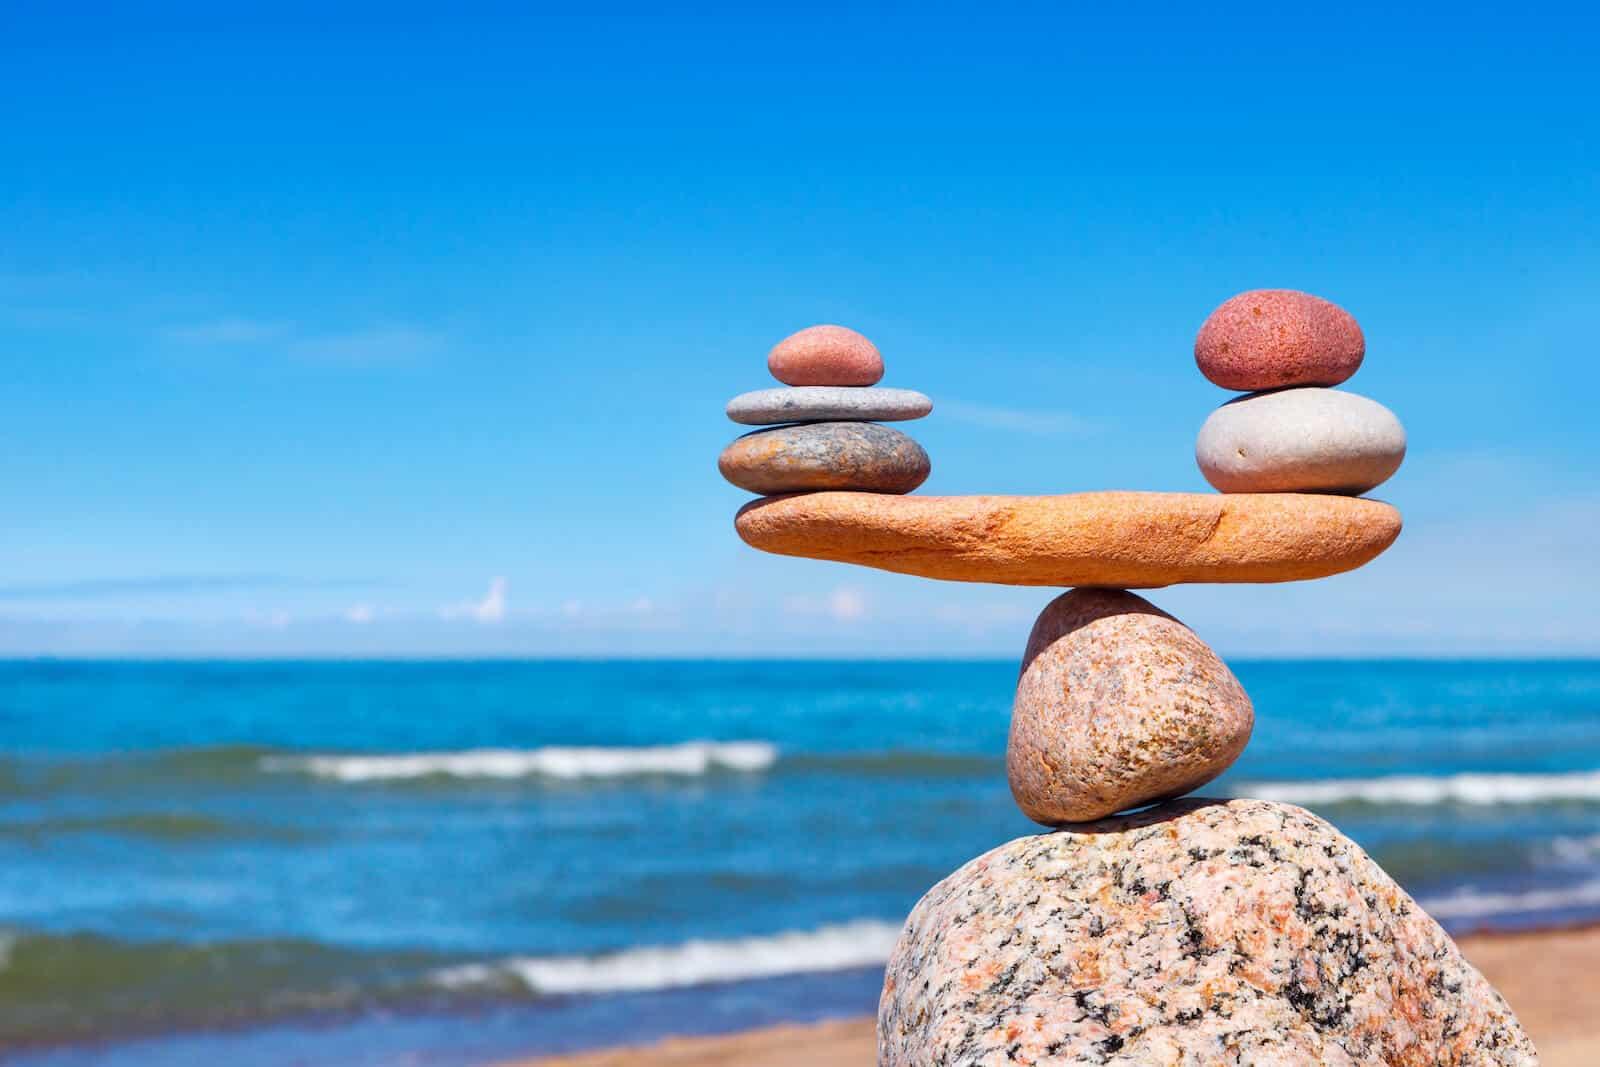 Balanced stones by the sea